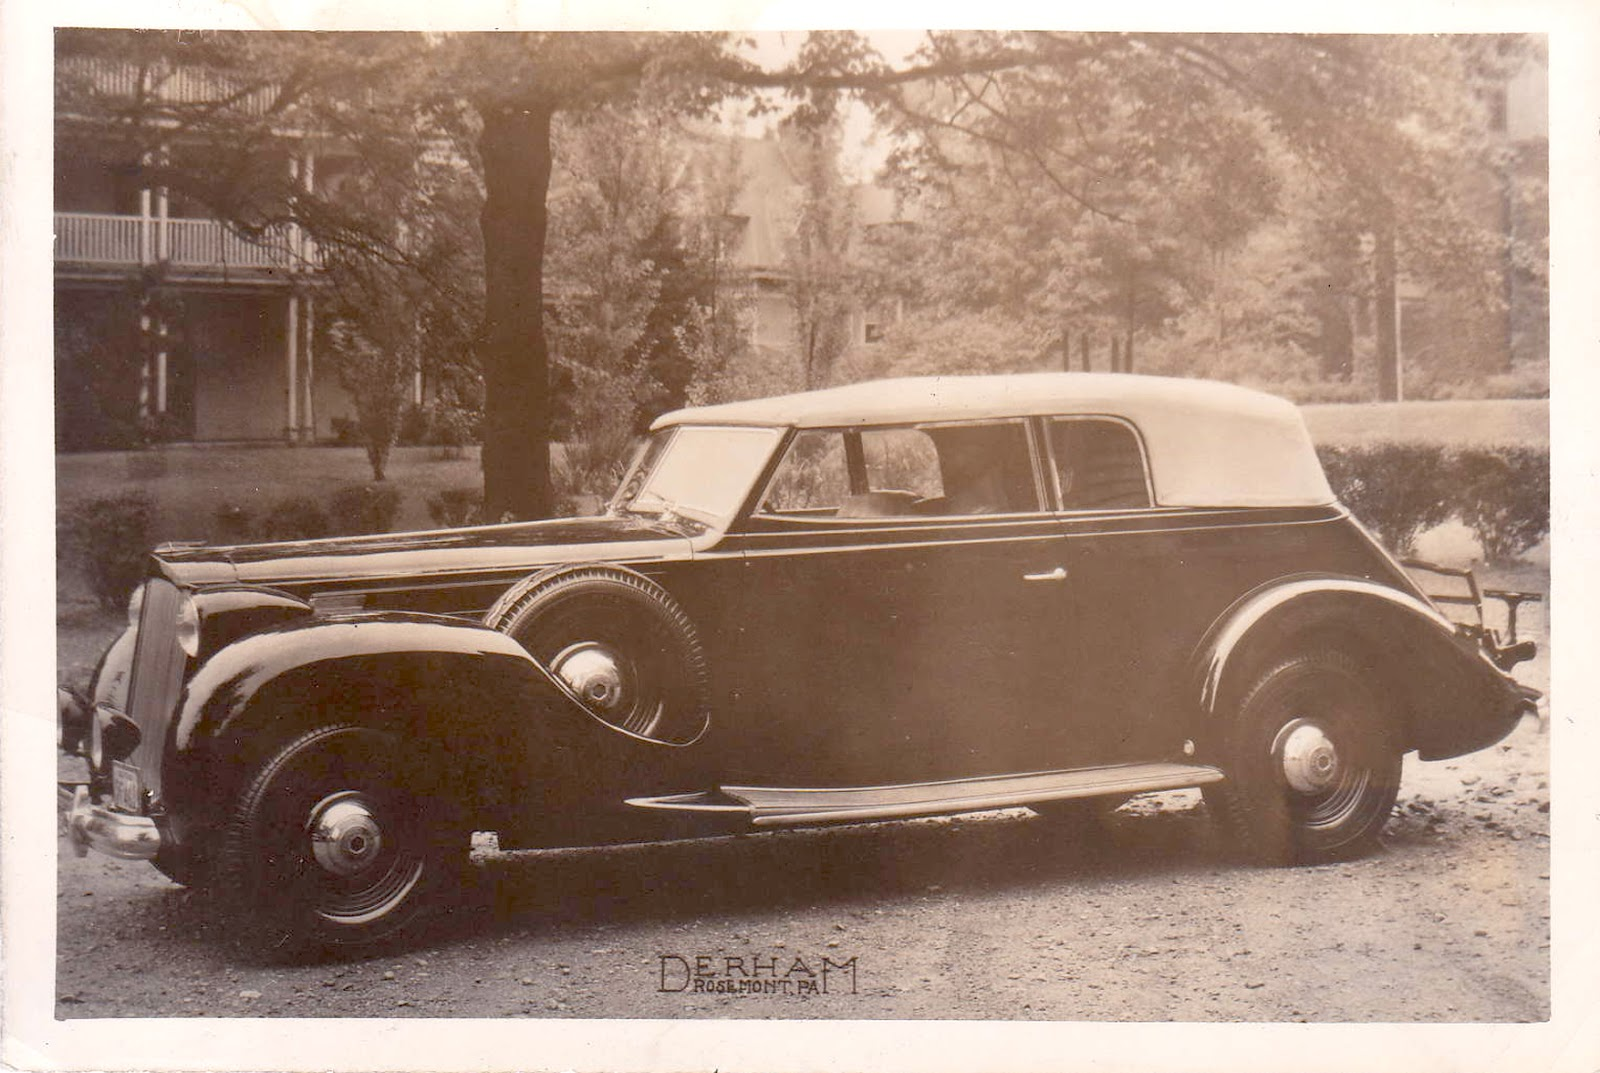 Vintage Motoring Blog: Derham bodied Packard, Pierce and Cadillac